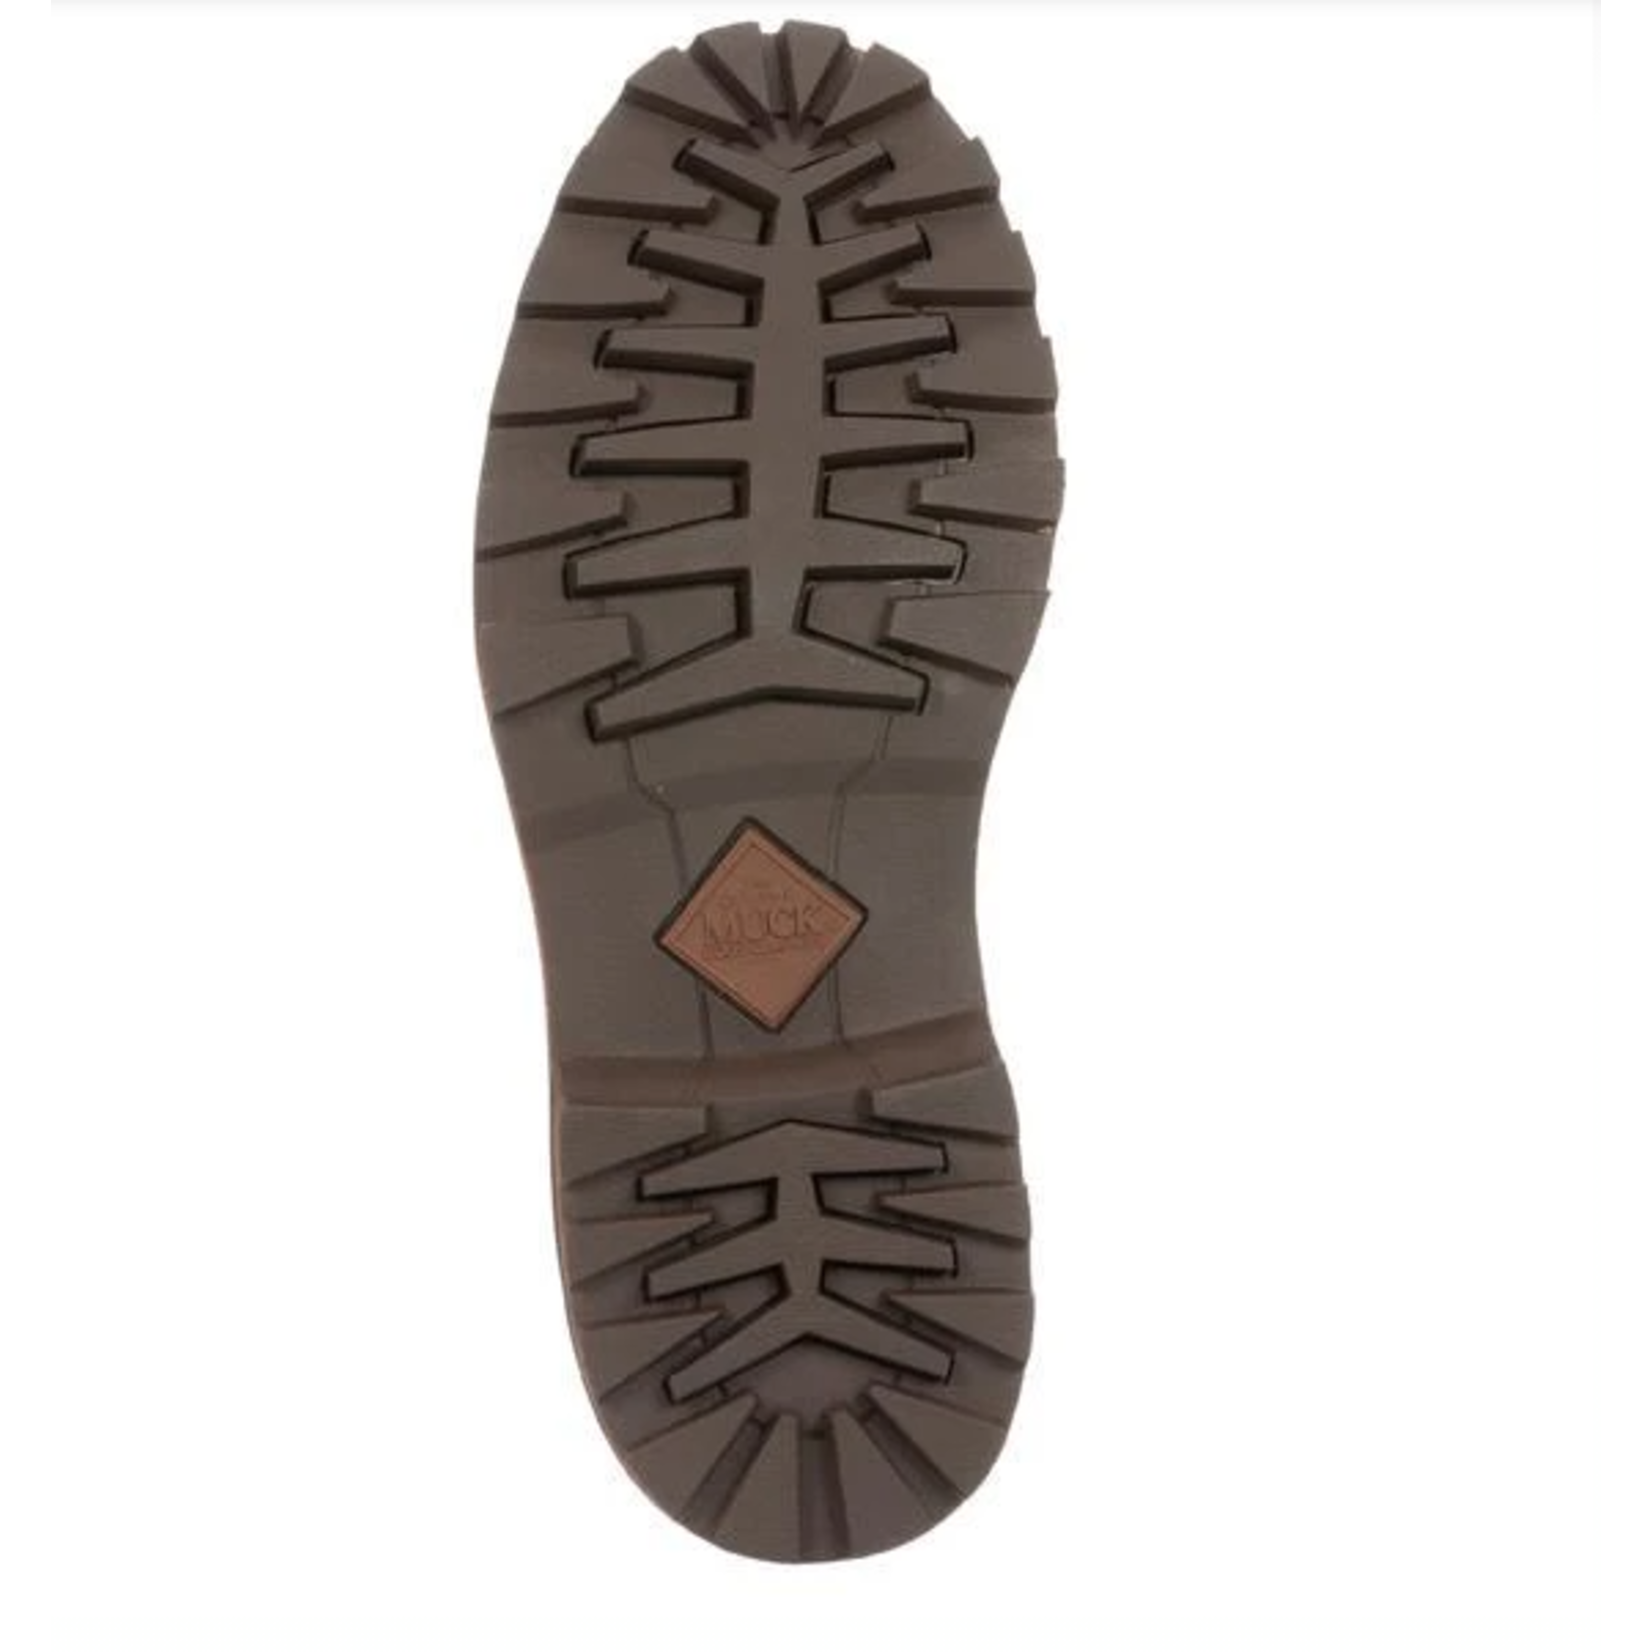 Muck Muck Men's Freeman Brown Casual Leather Boot Waterproof Subzero LMM-900